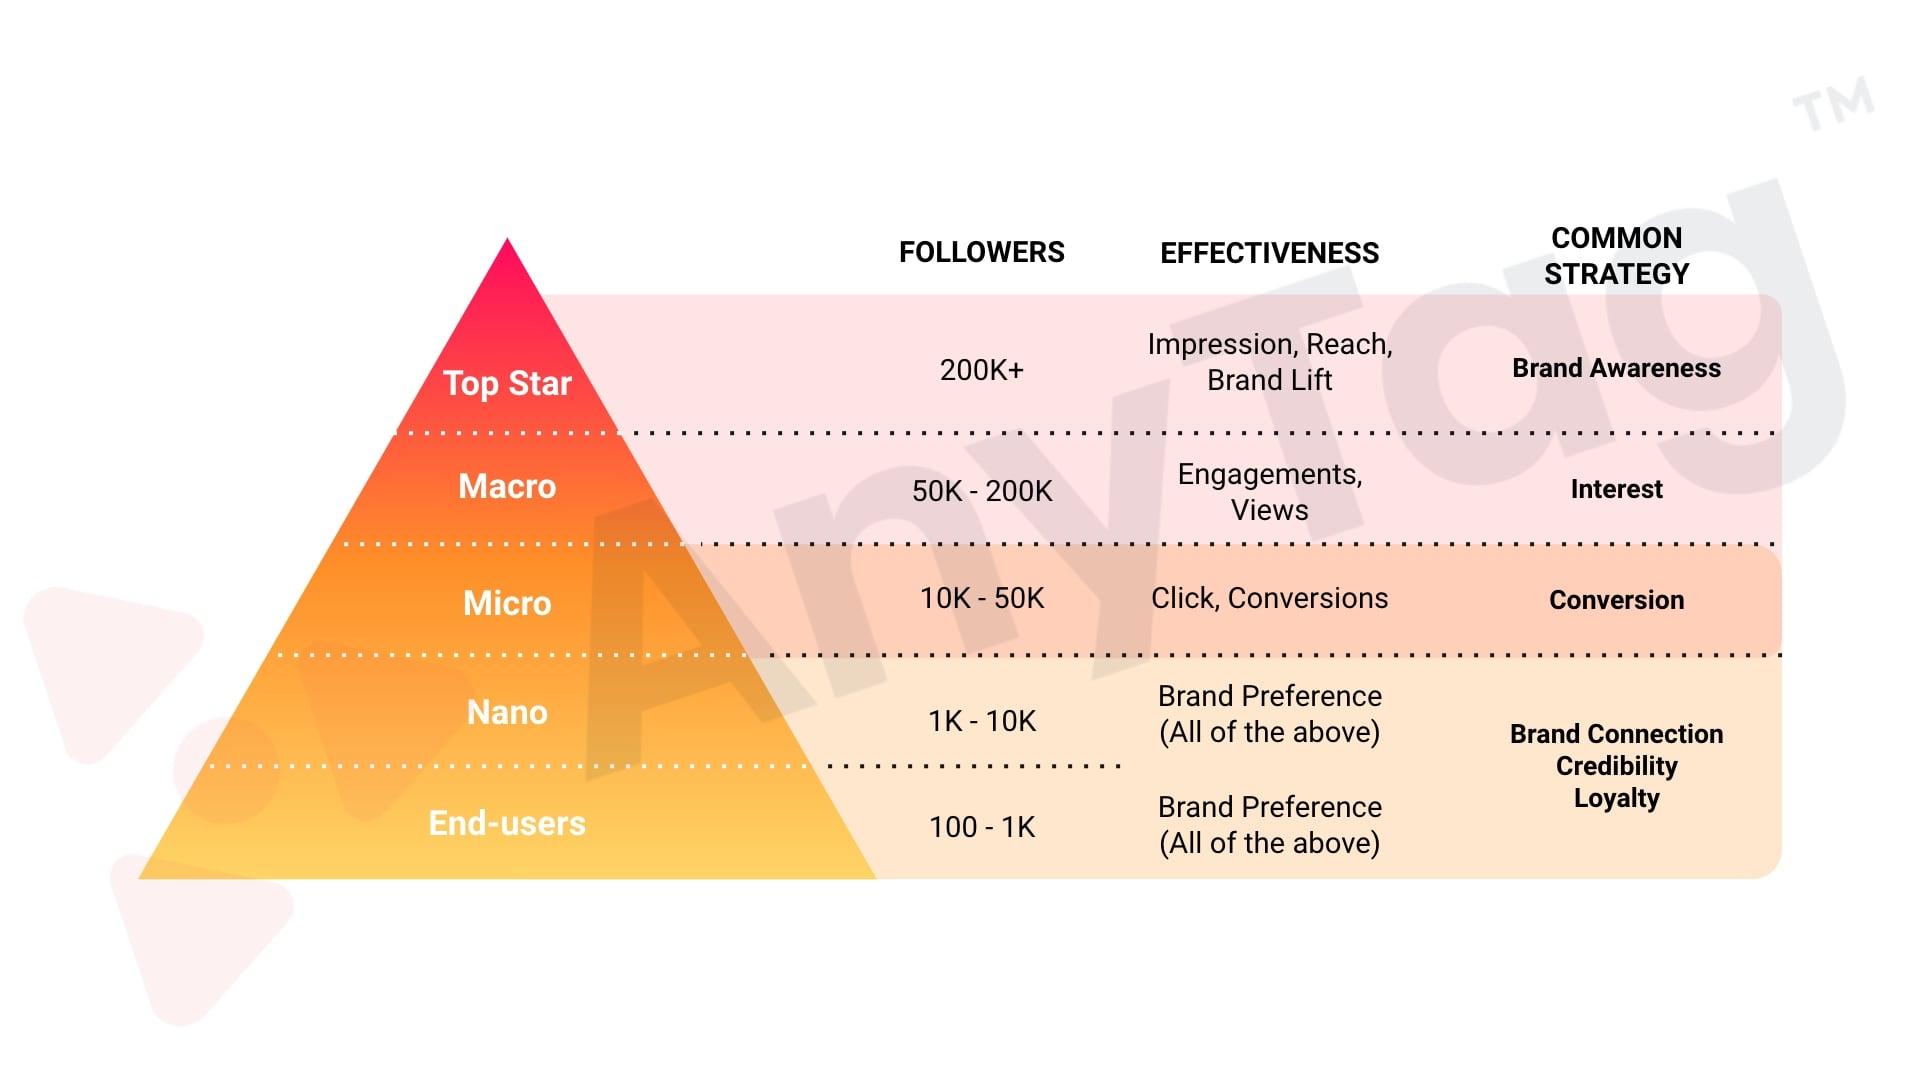 Hong Kong social influencer categorization